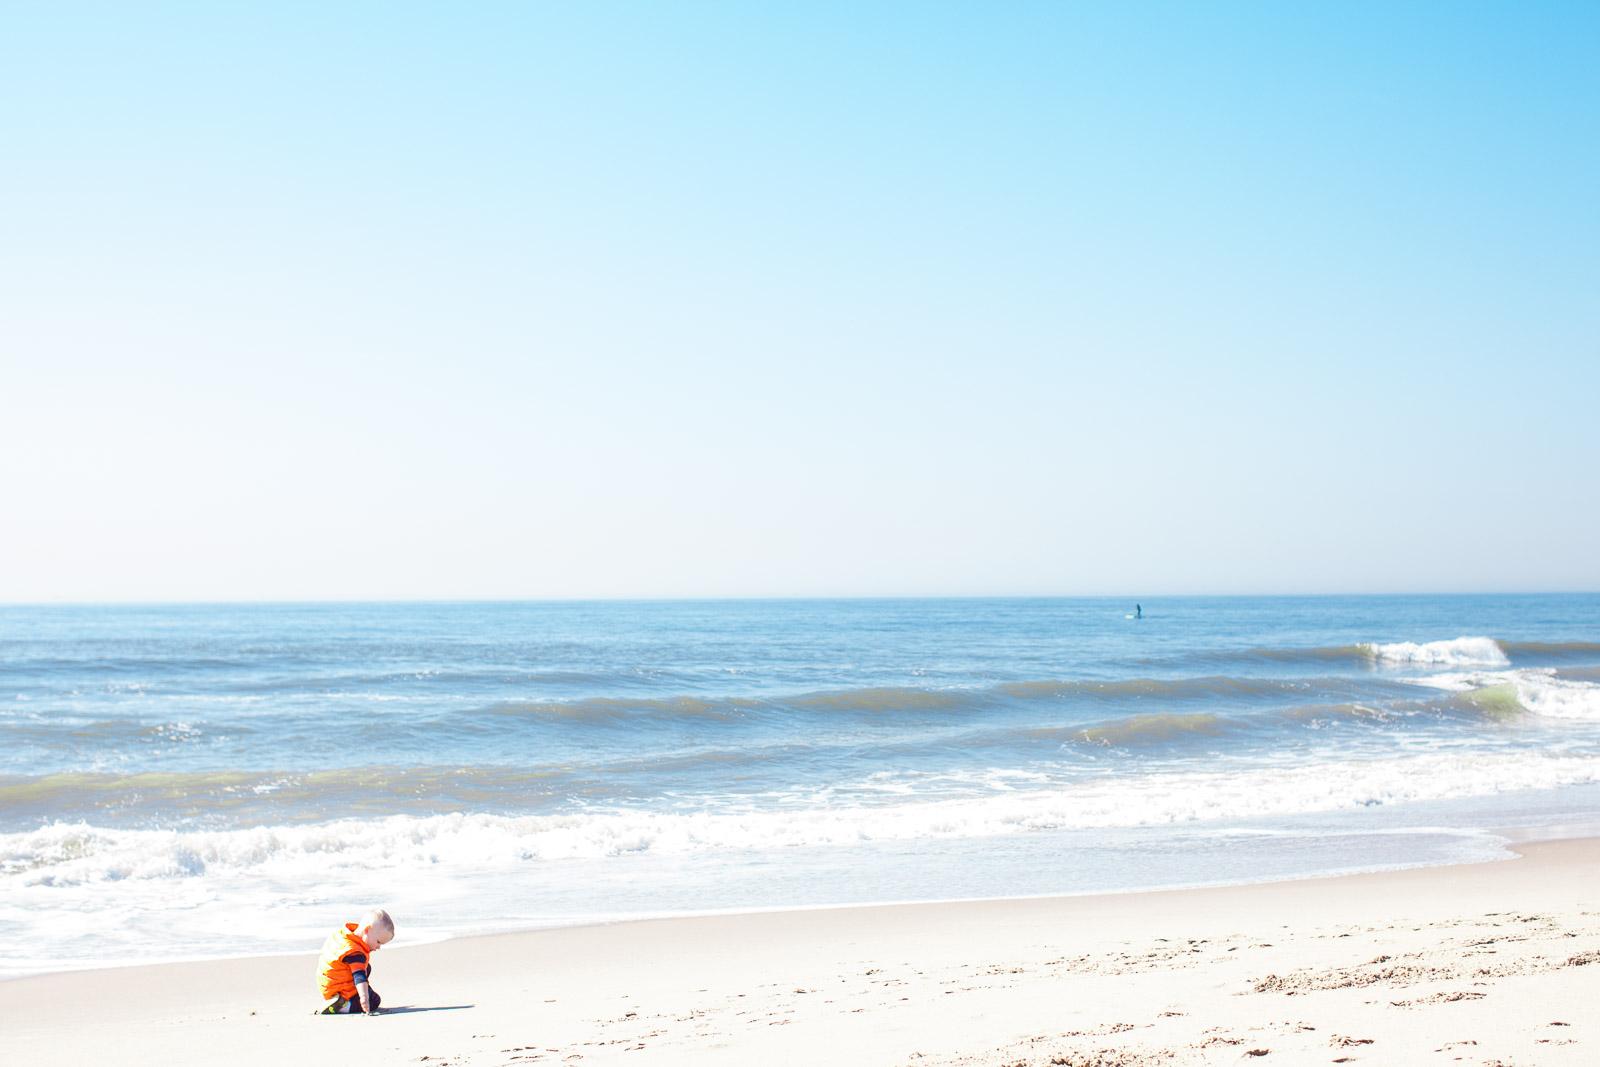 rockaway-beach-april-2015-2-robertiaga-6